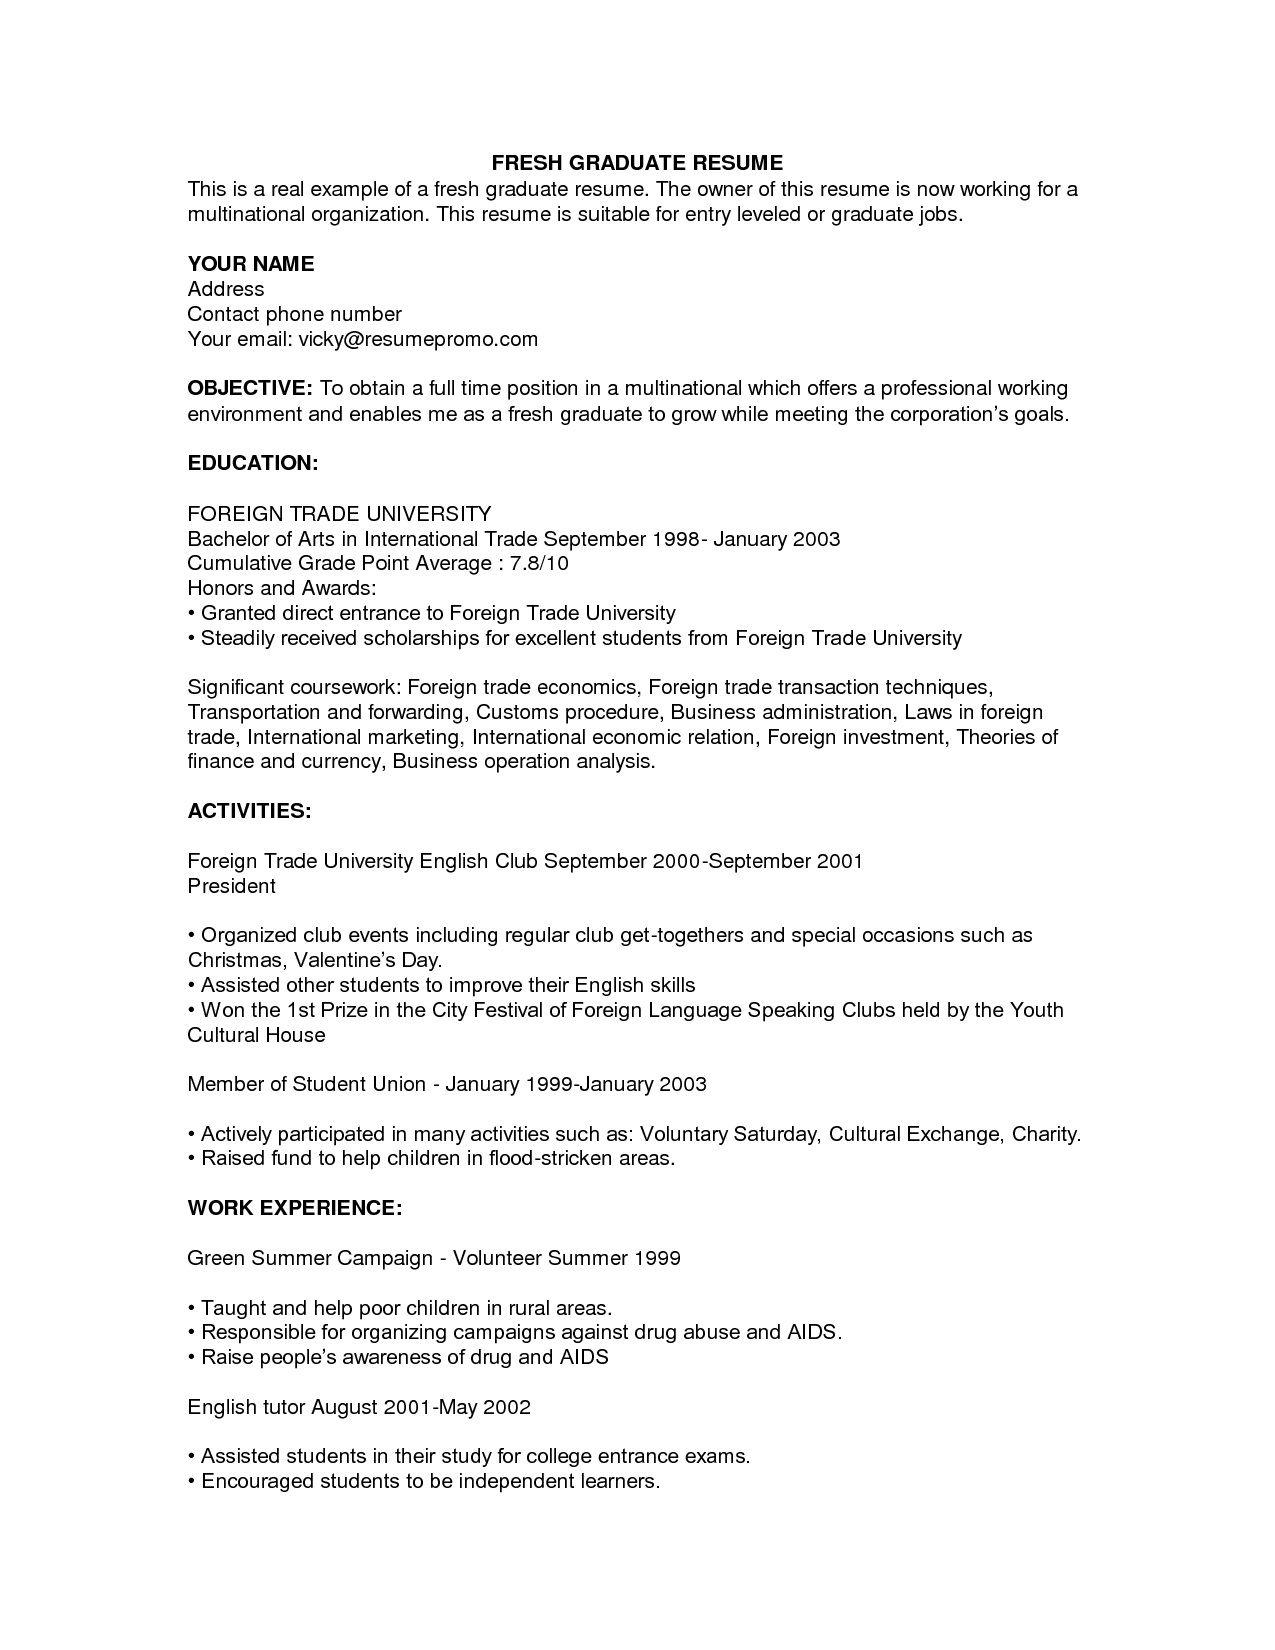 Job Resume Sample For Fresh Graduate